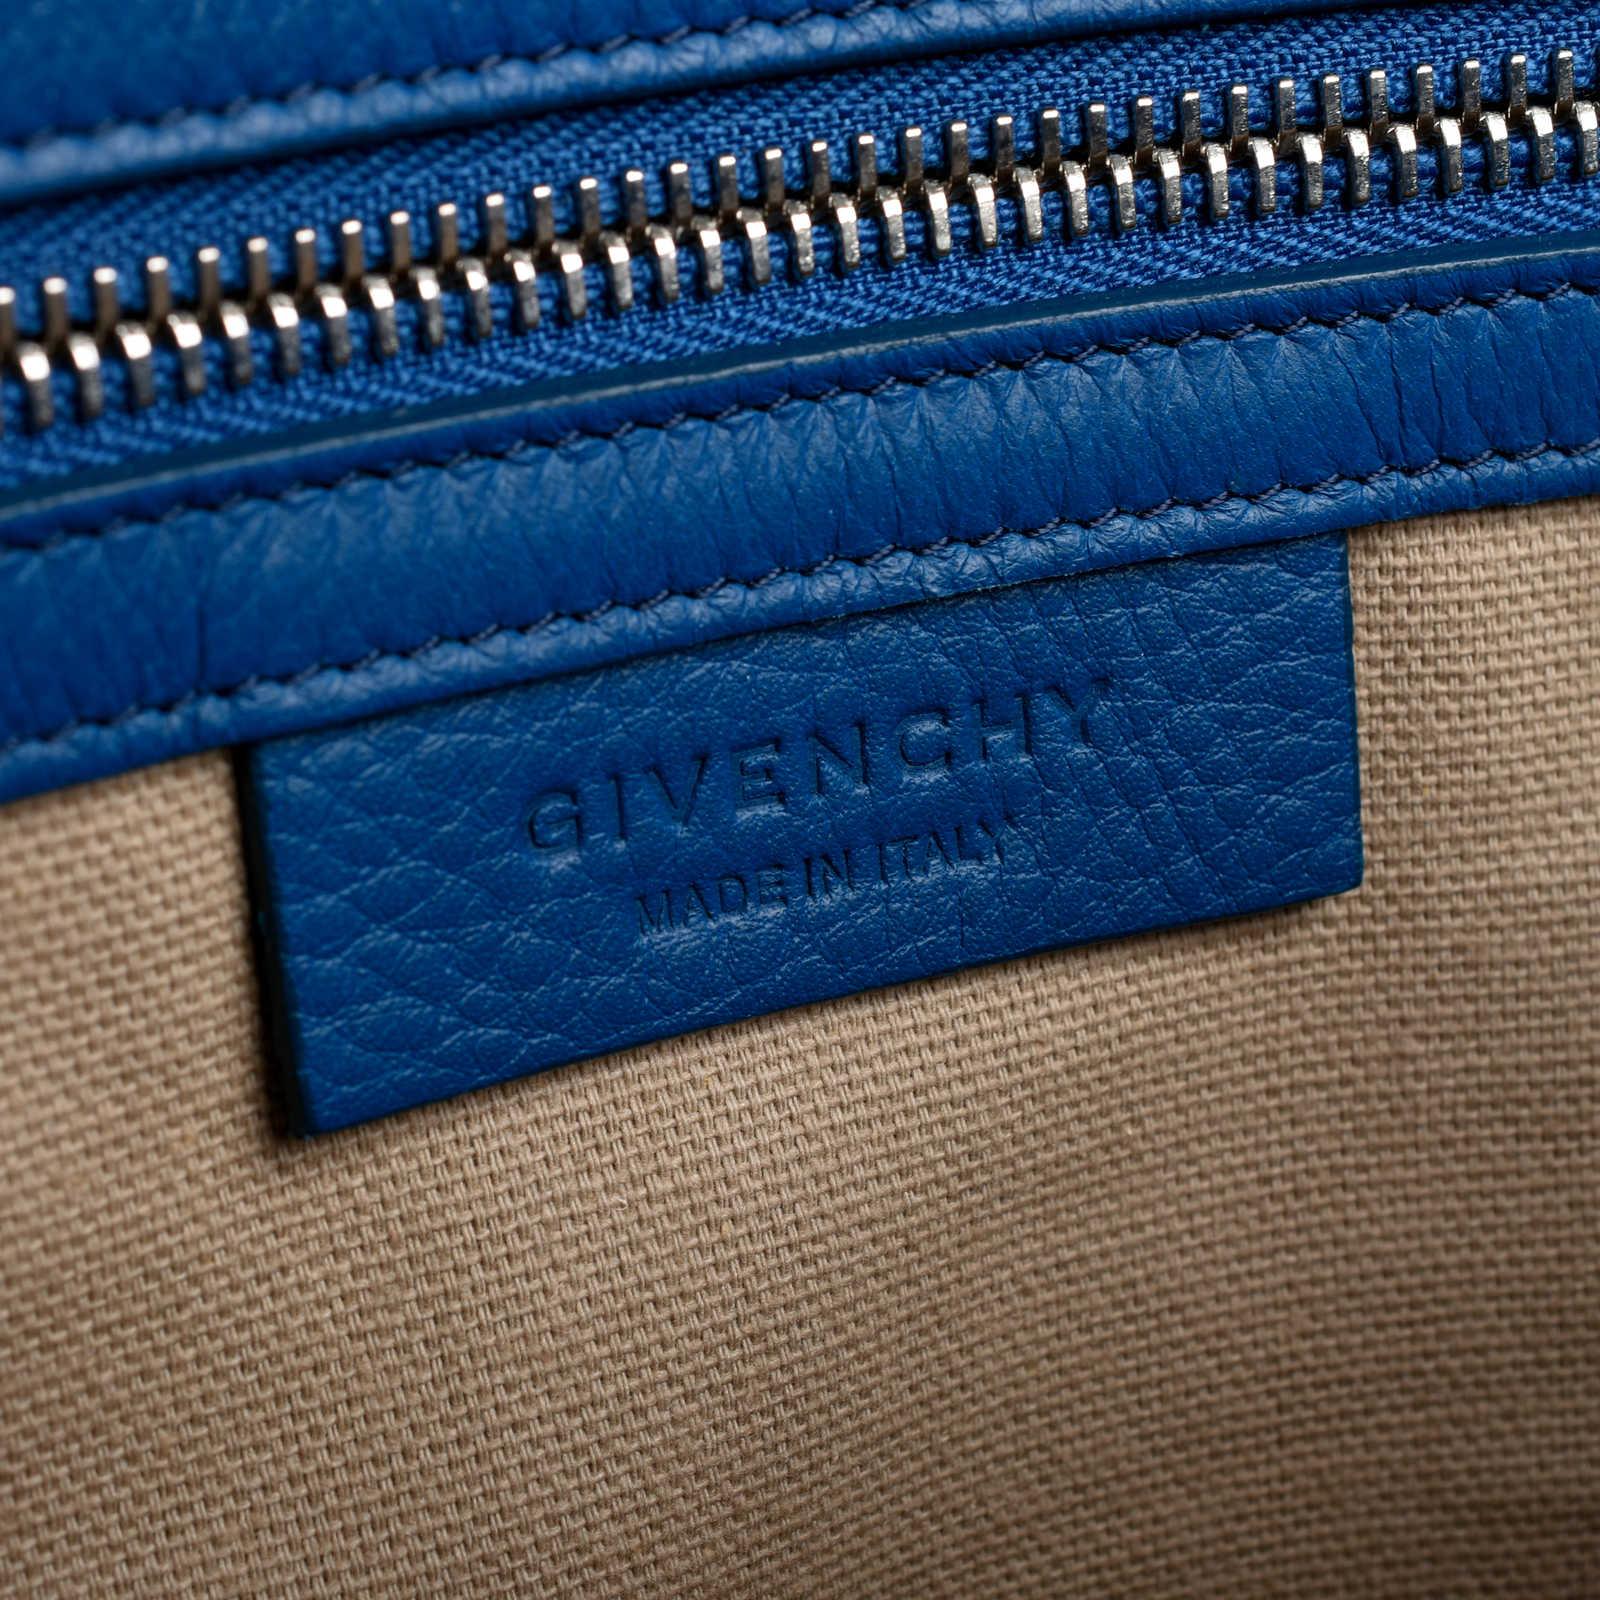 3acfb4fce225 ... Authentic Second Hand Givenchy Pandora Pure Medium Satchel  (PSS-475-00010) -